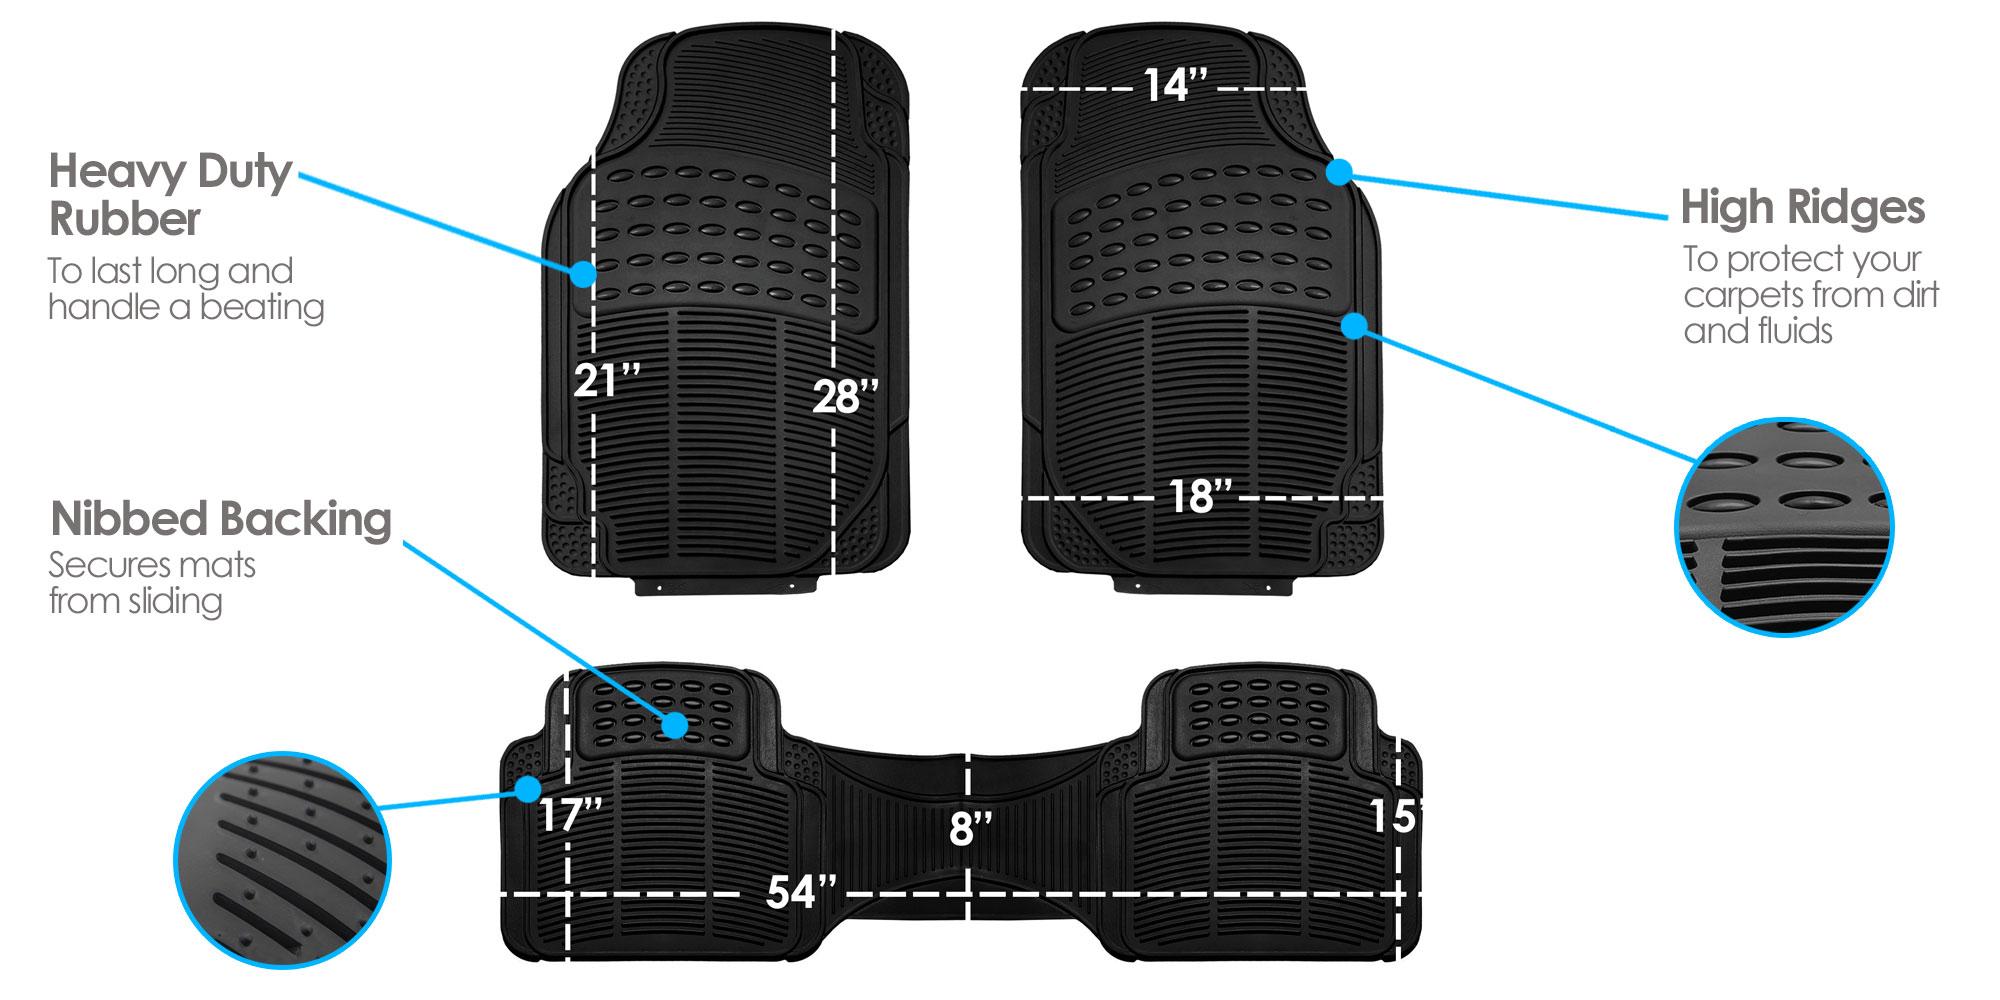 3pc-Floor-Mats-for-Auto-Car-SUV-Van-Heavy-Duty-3-Colors-w-Free-Gift thumbnail 16